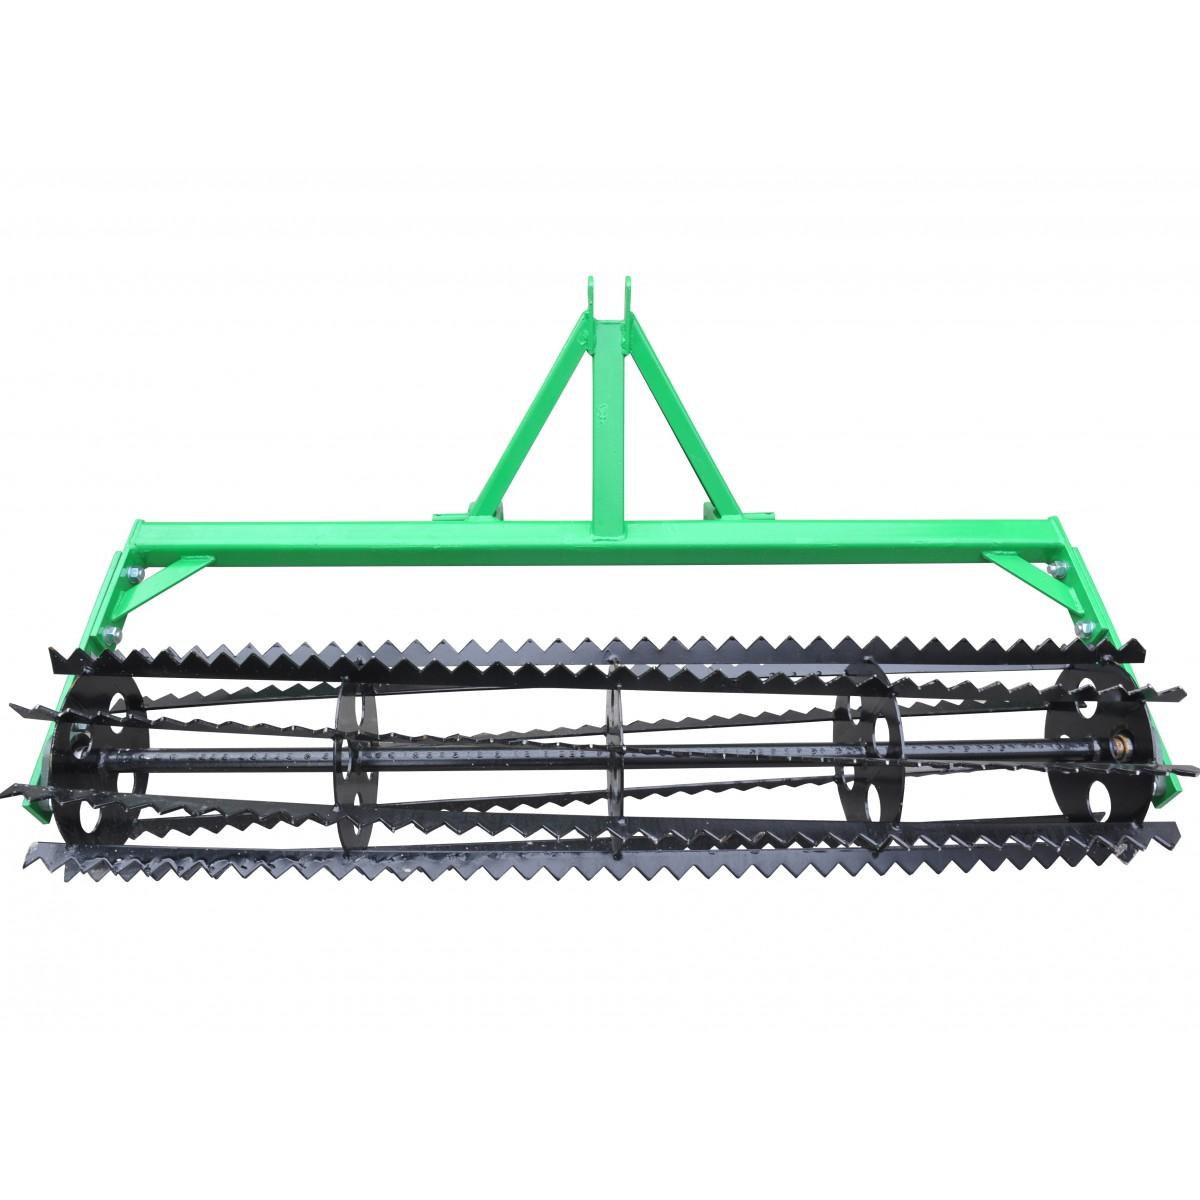 String roller for the cultivator 180 cm